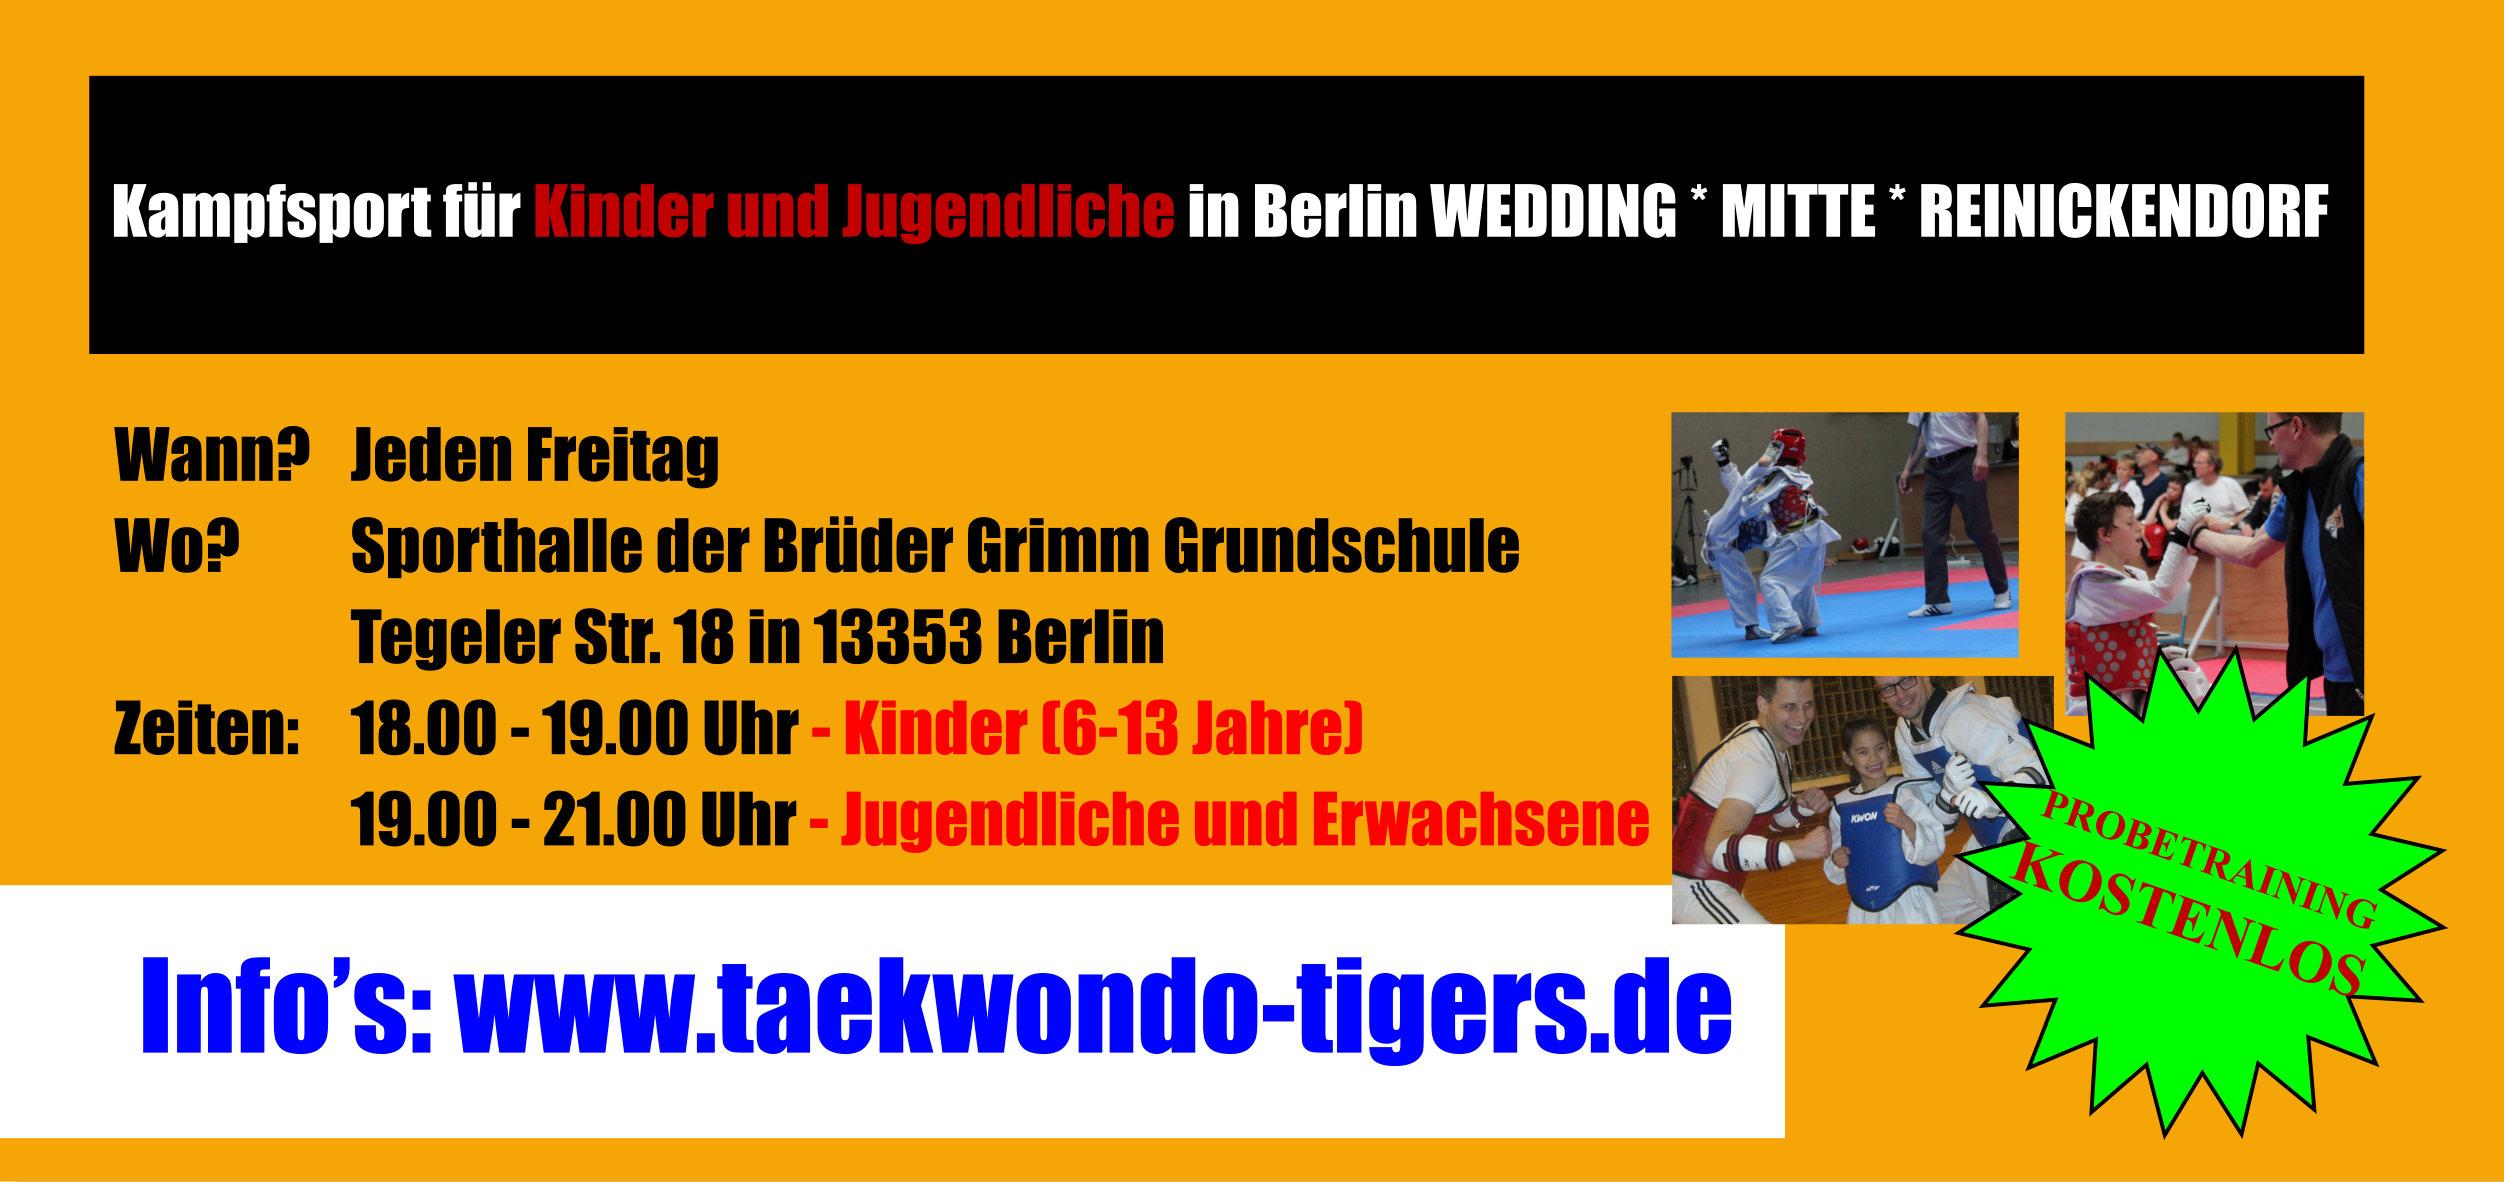 Flyer der Kindergruppe der Taekwondo Tigers Berlin